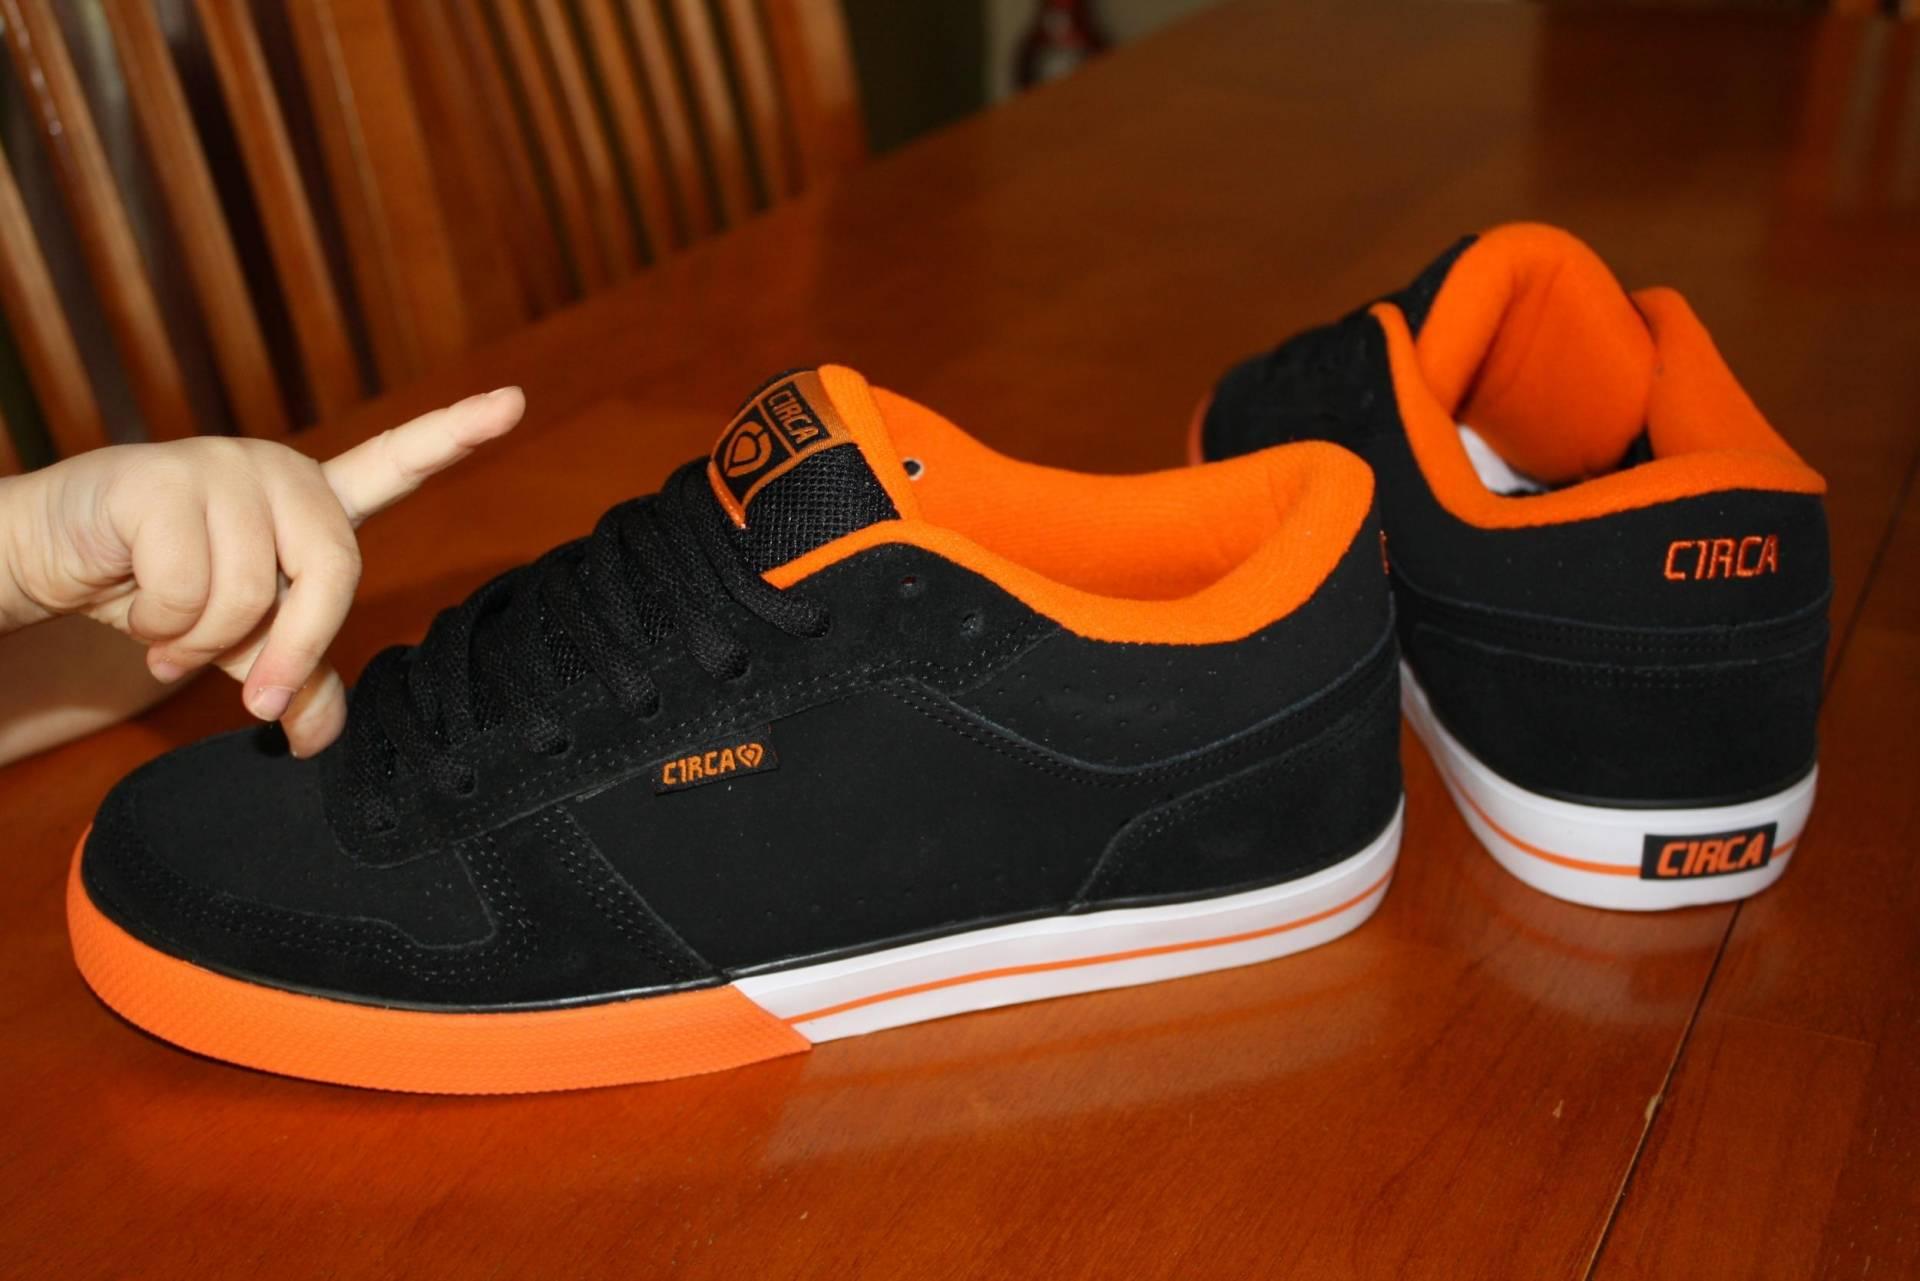 Skate shoes size 9 - File Size 146 9 Kb